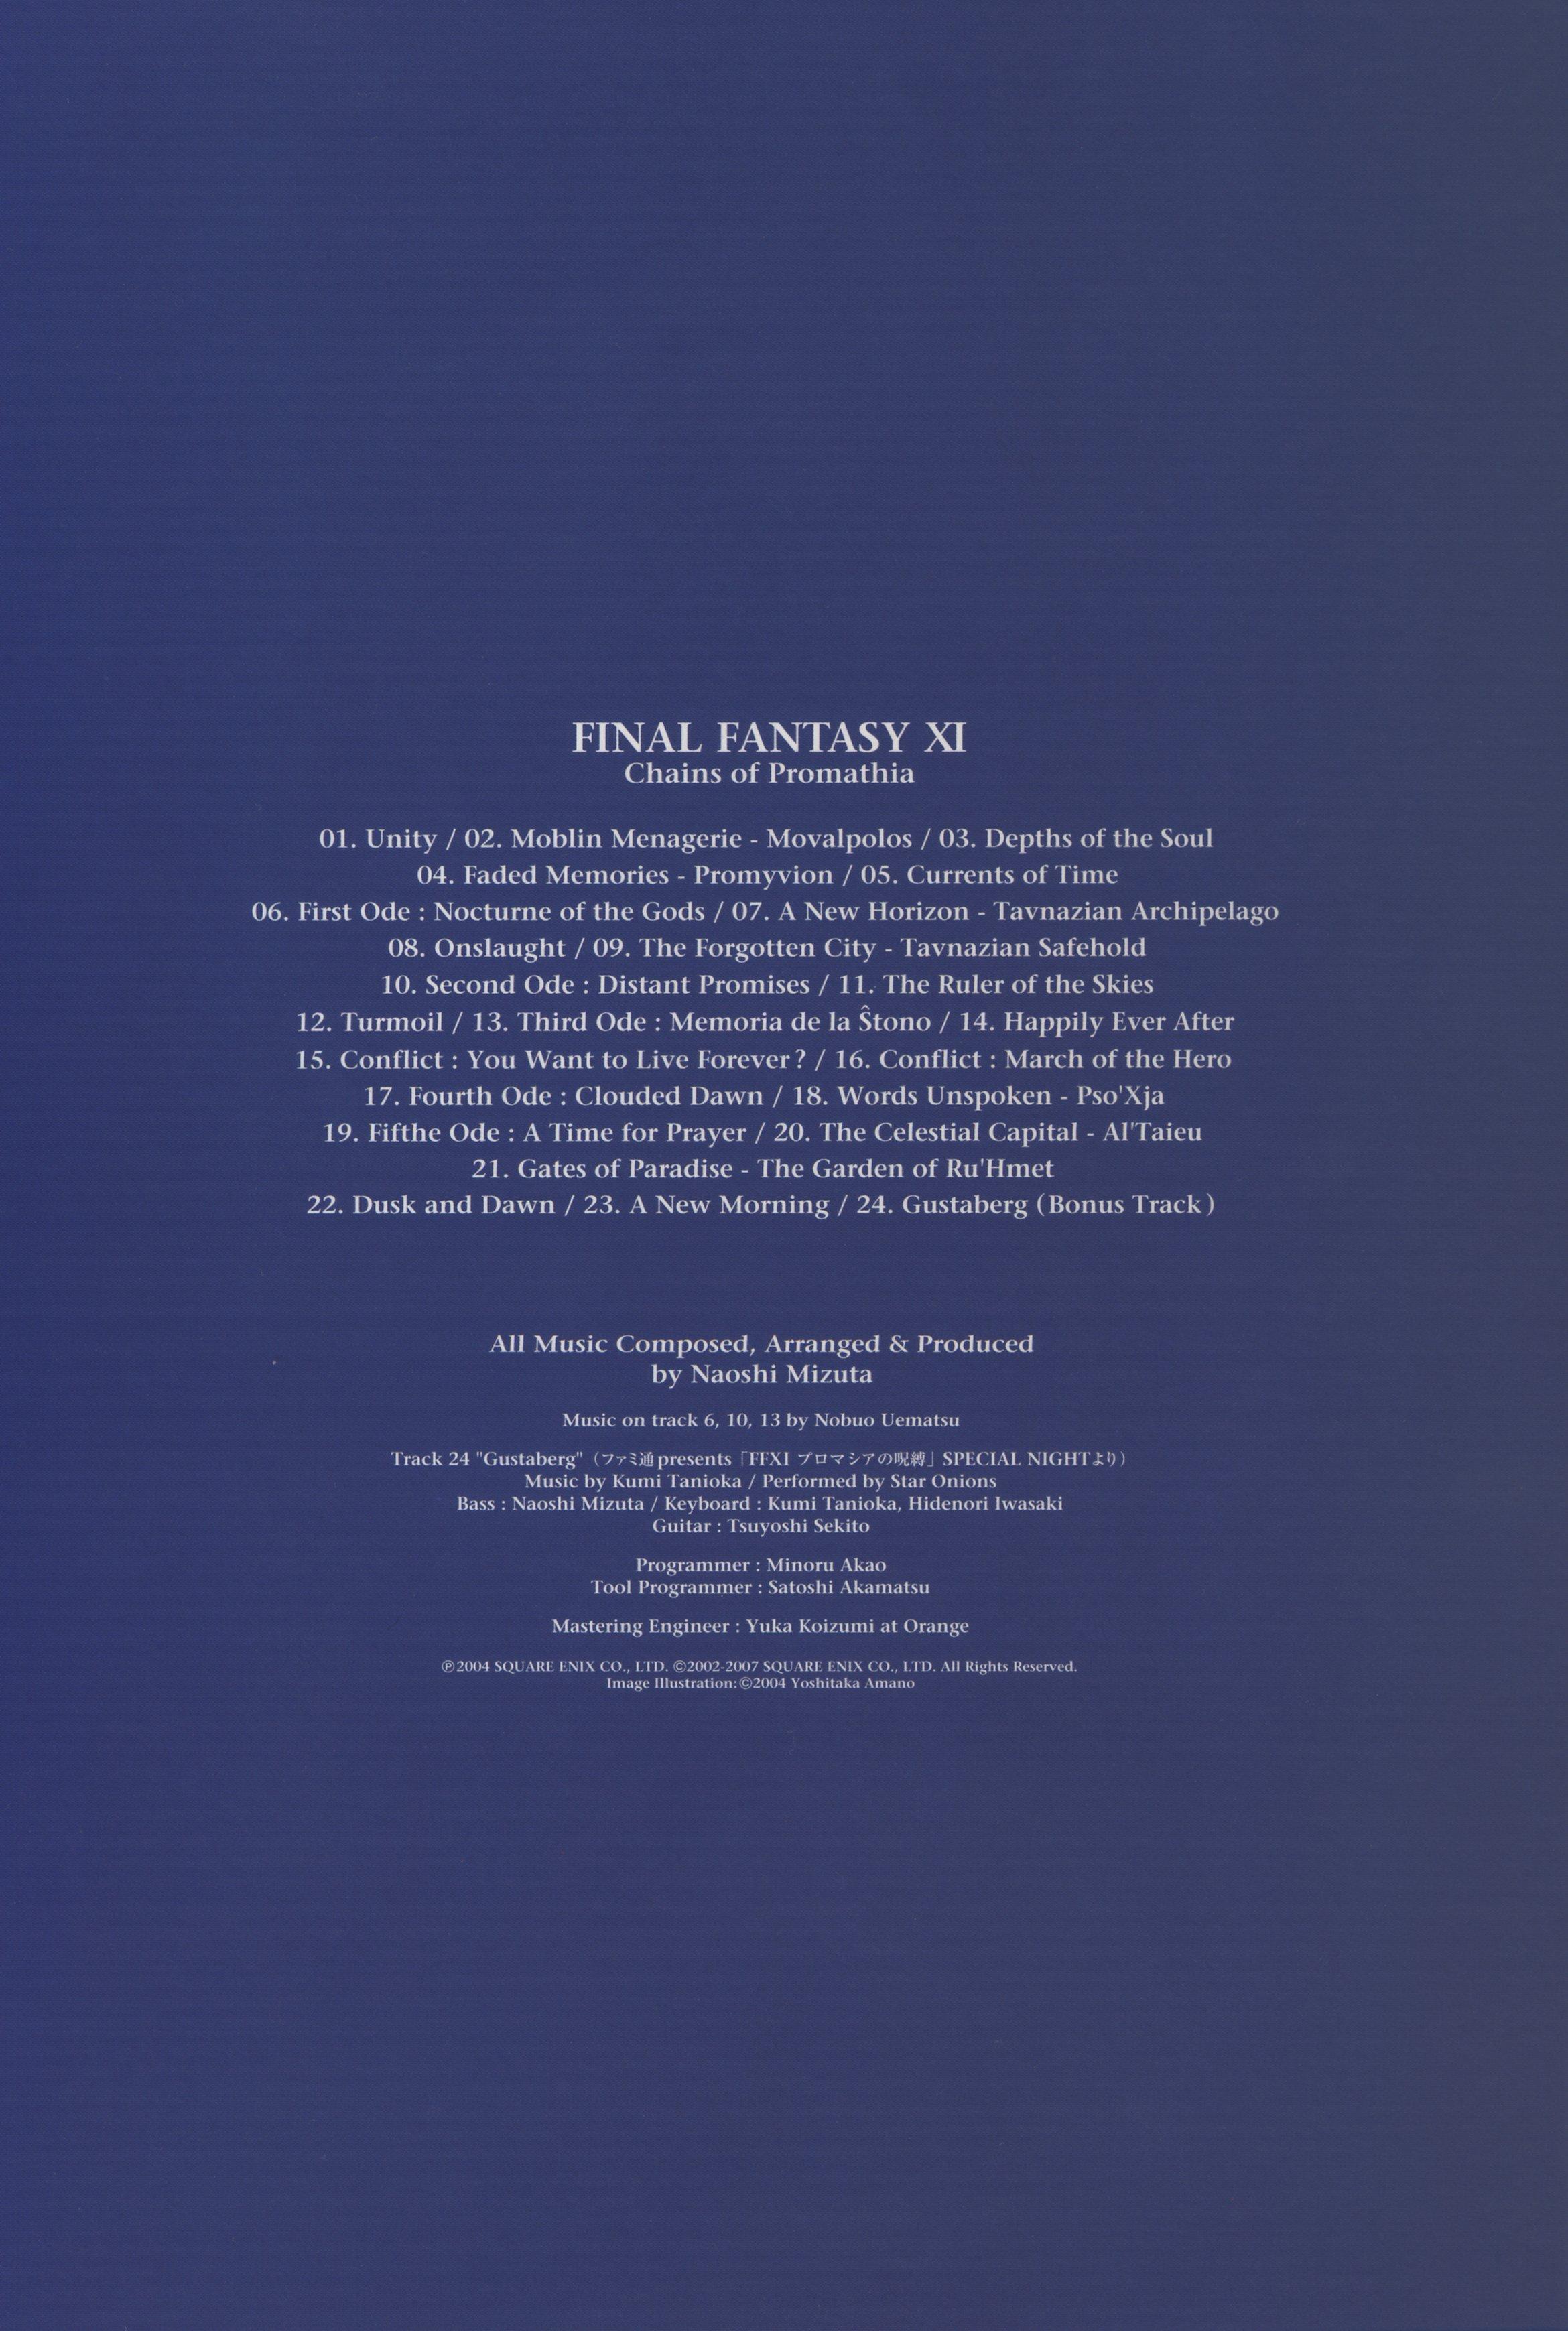 FINAL FANTASY XI Original Soundtrack PREMIUM BOX  Soundtrack